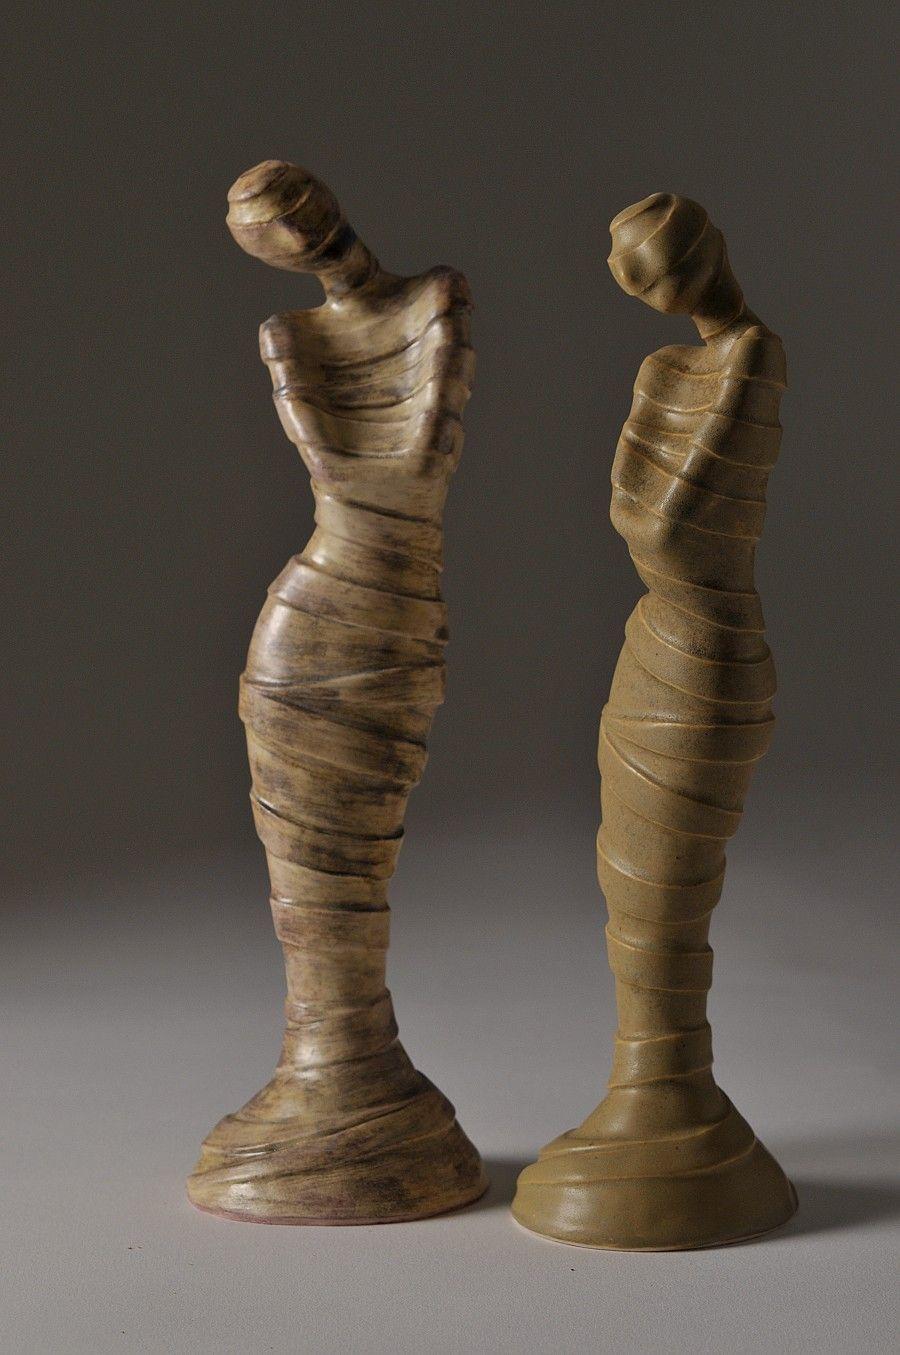 Ferri farahmandi ceramics gallery sculptures